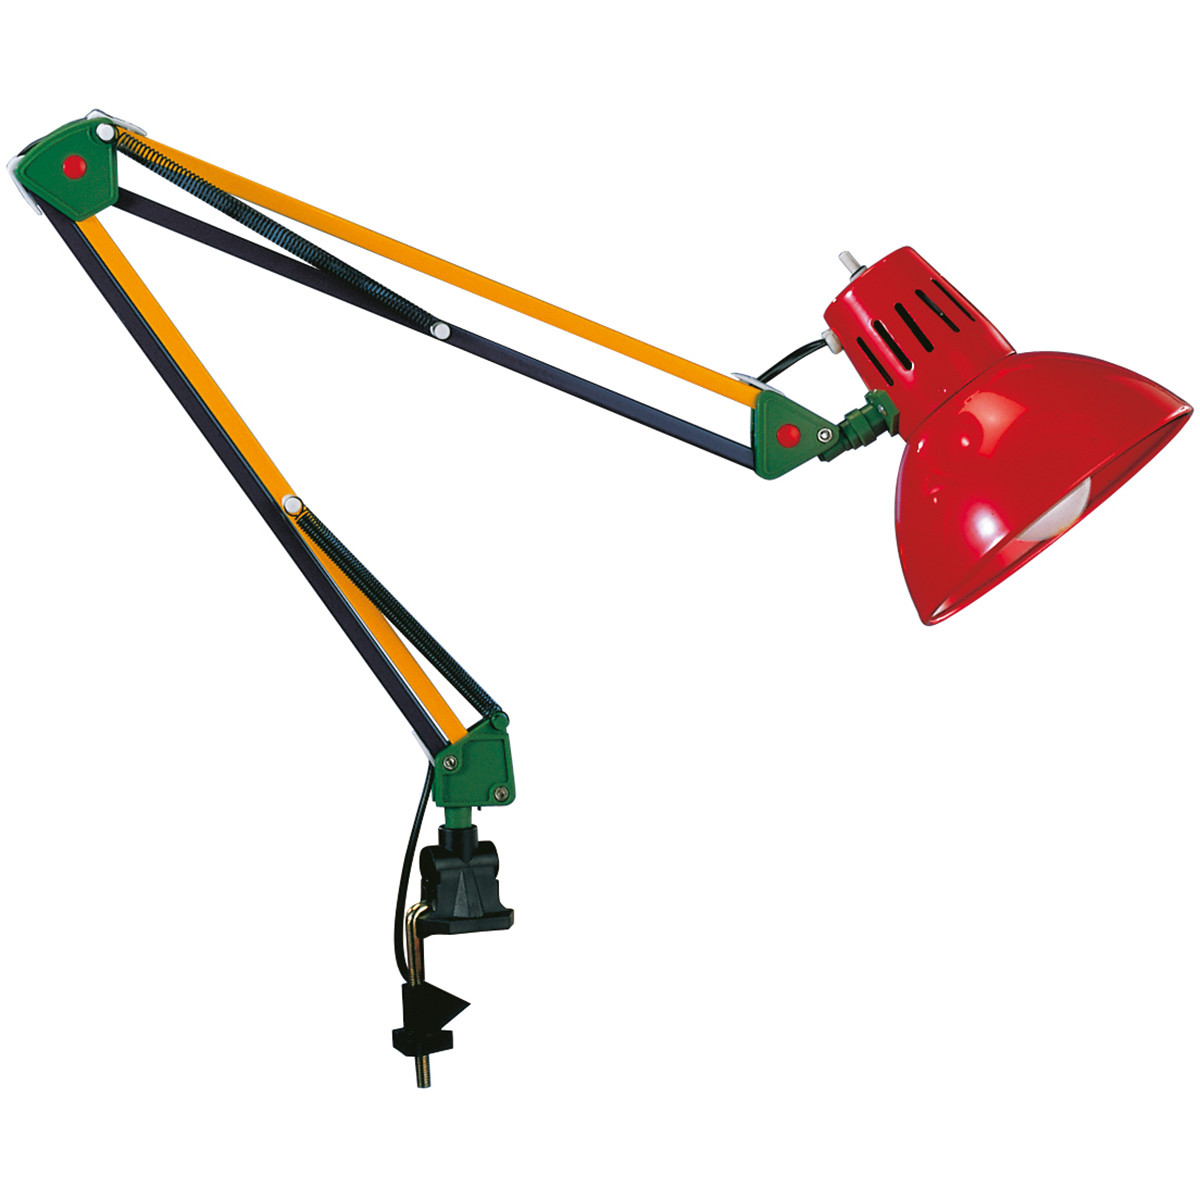 LED Klemlamp - Trion Tajin - E27 Fitting - Meerkleurig - Aluminium